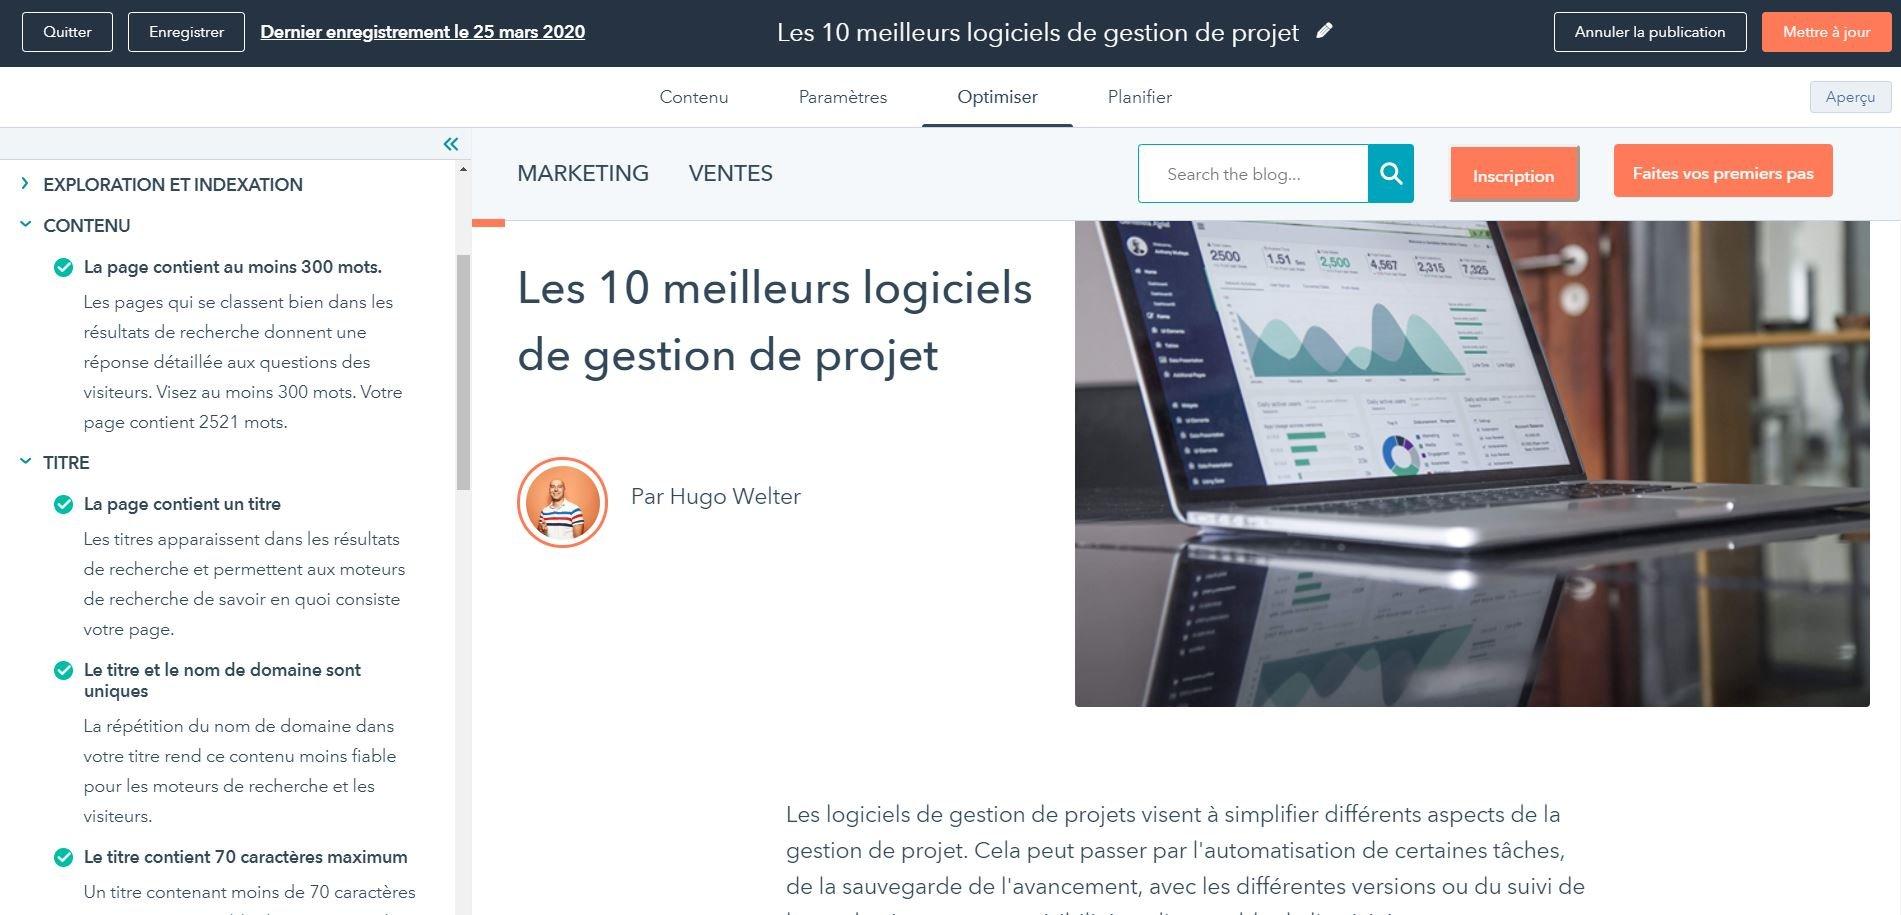 Infos en ligne : France info, un média utile ?